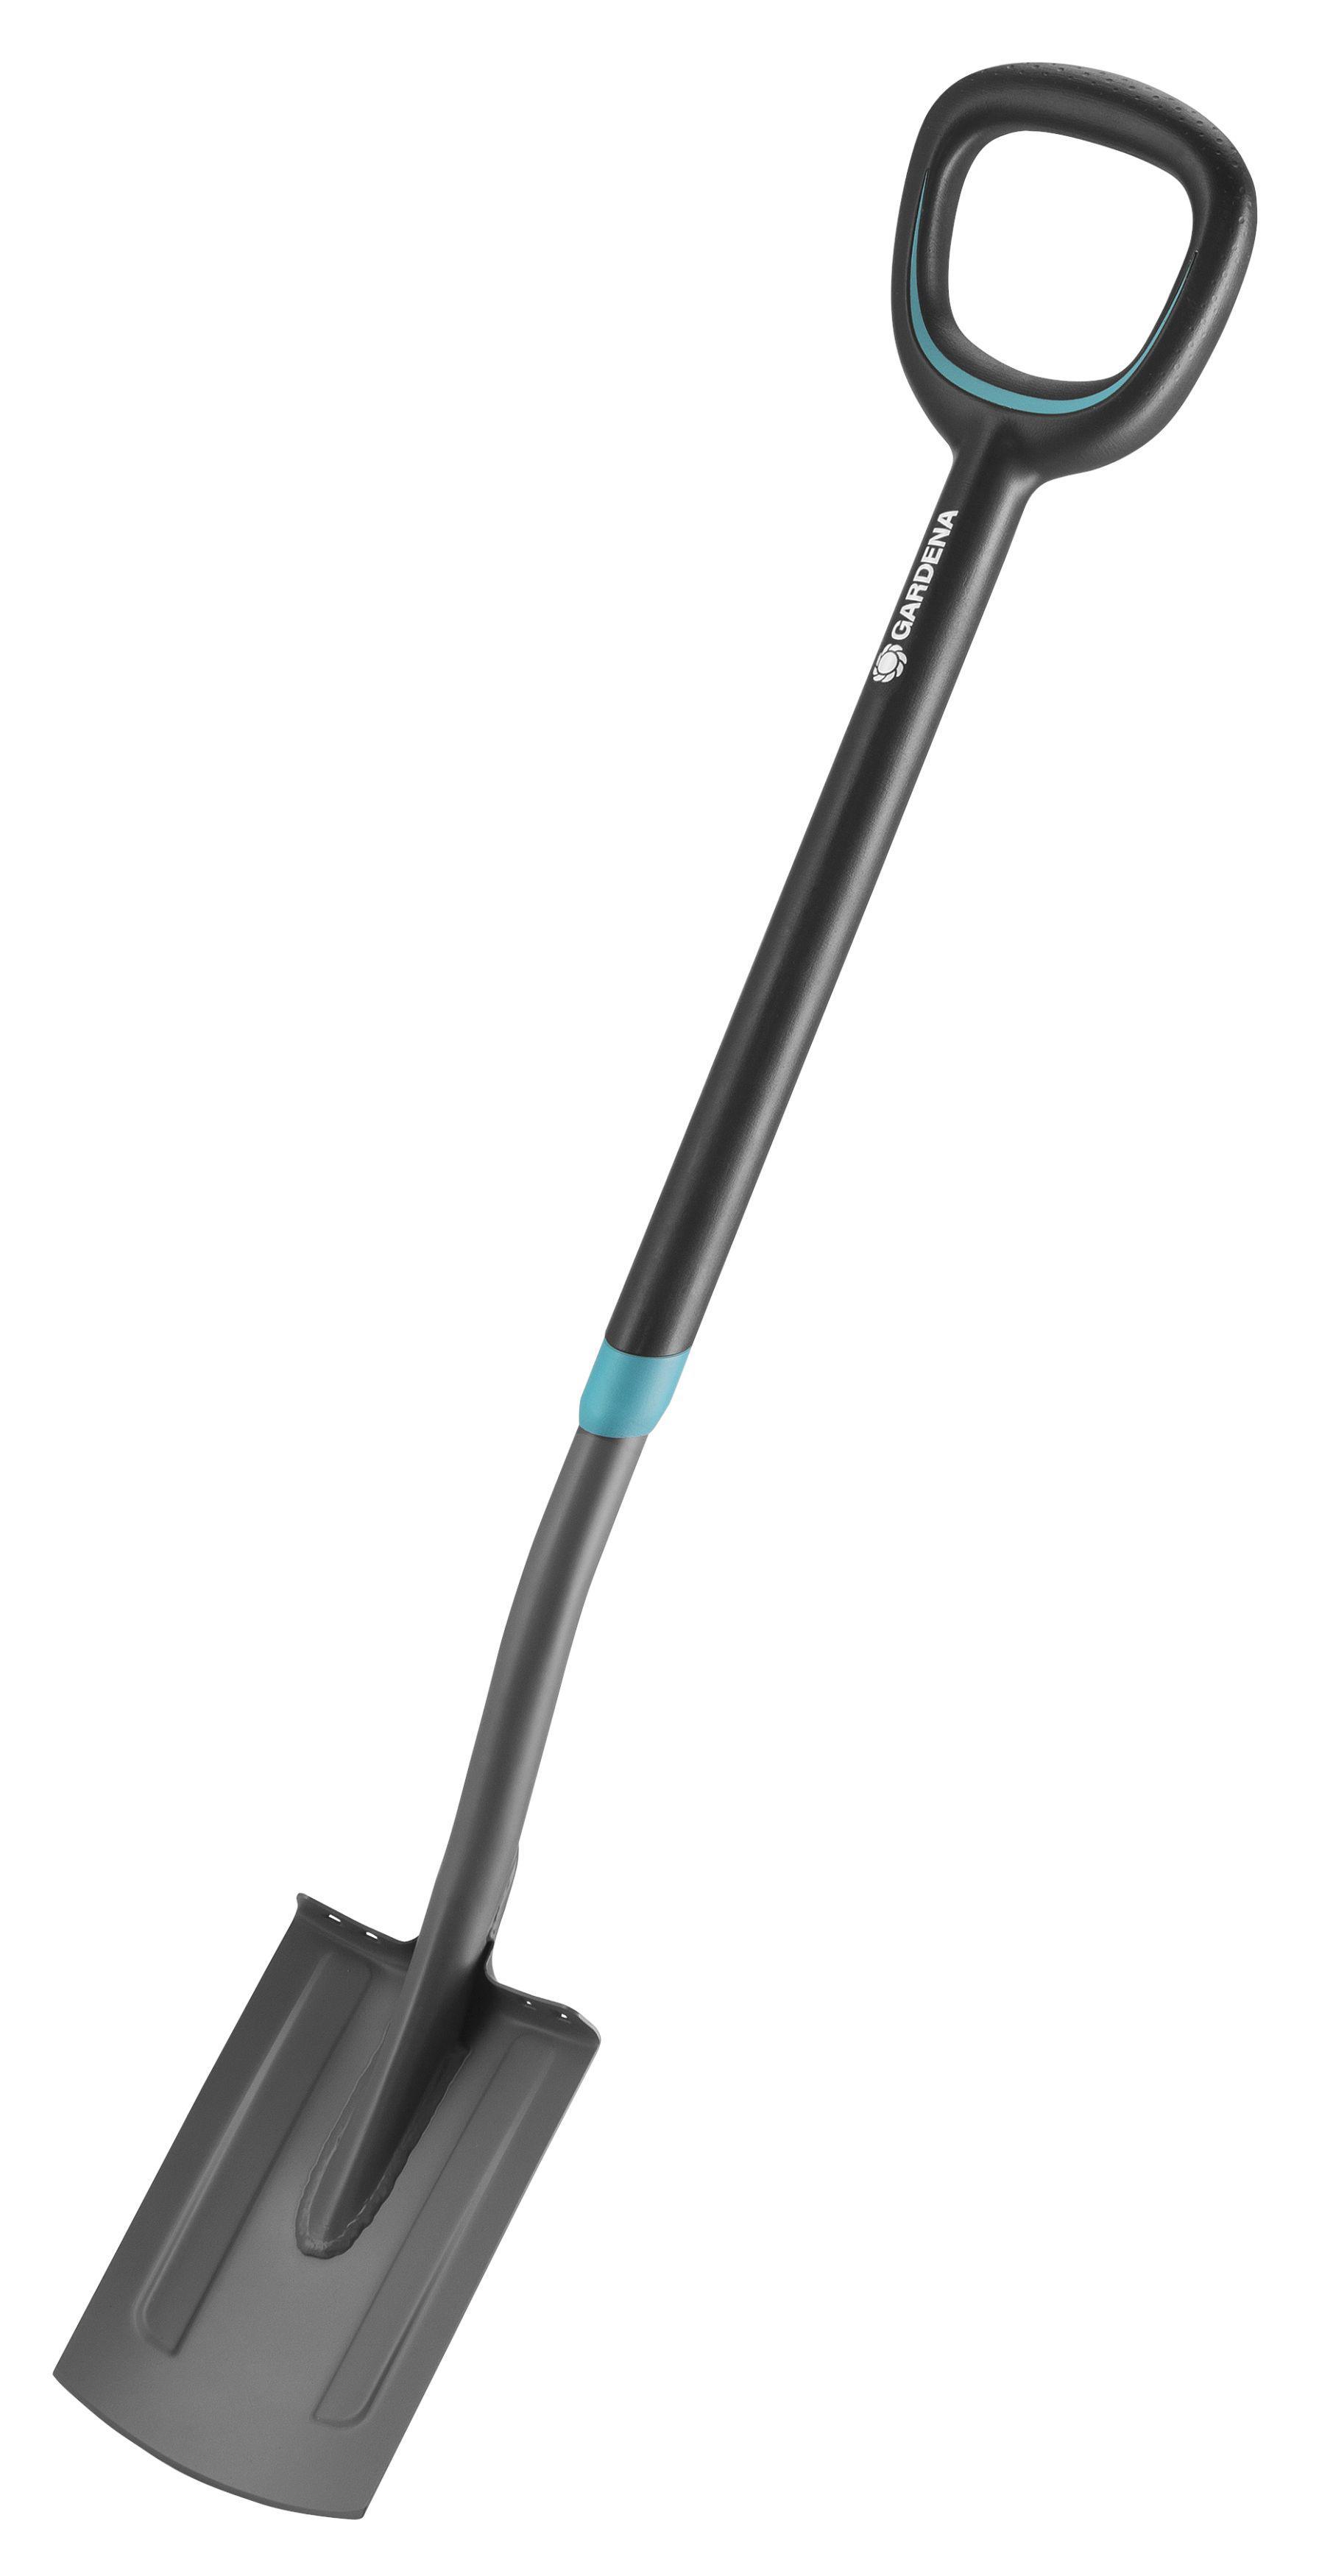 Лопата Gardena Ergoline 17011-20 лопата штыковая gardena ergoline 17011 20 000 00